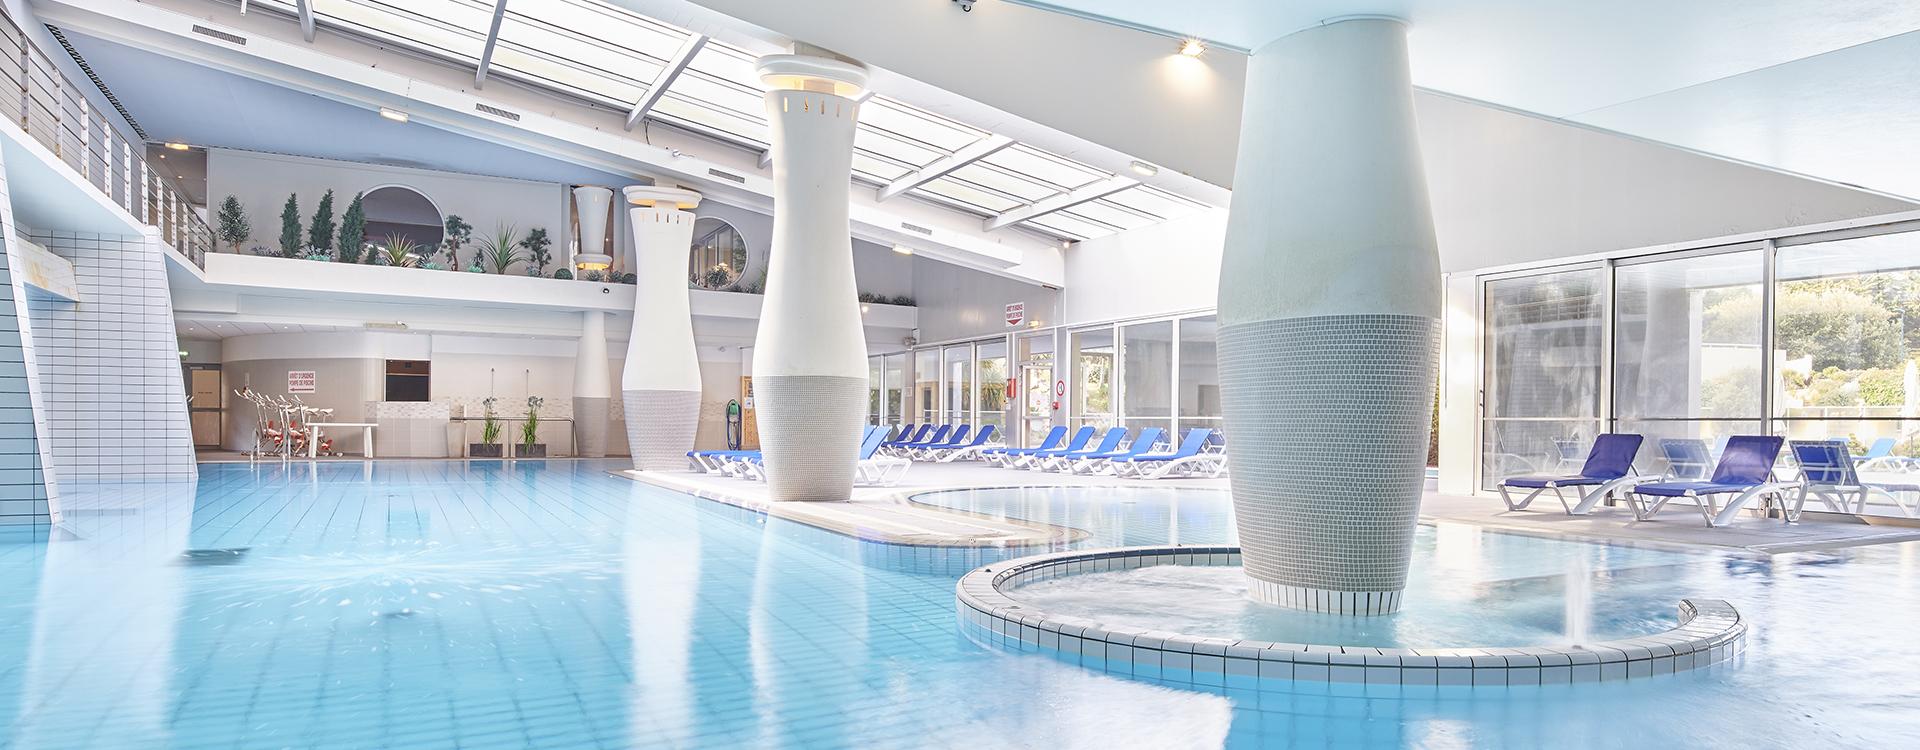 Jardins atlantique piscine